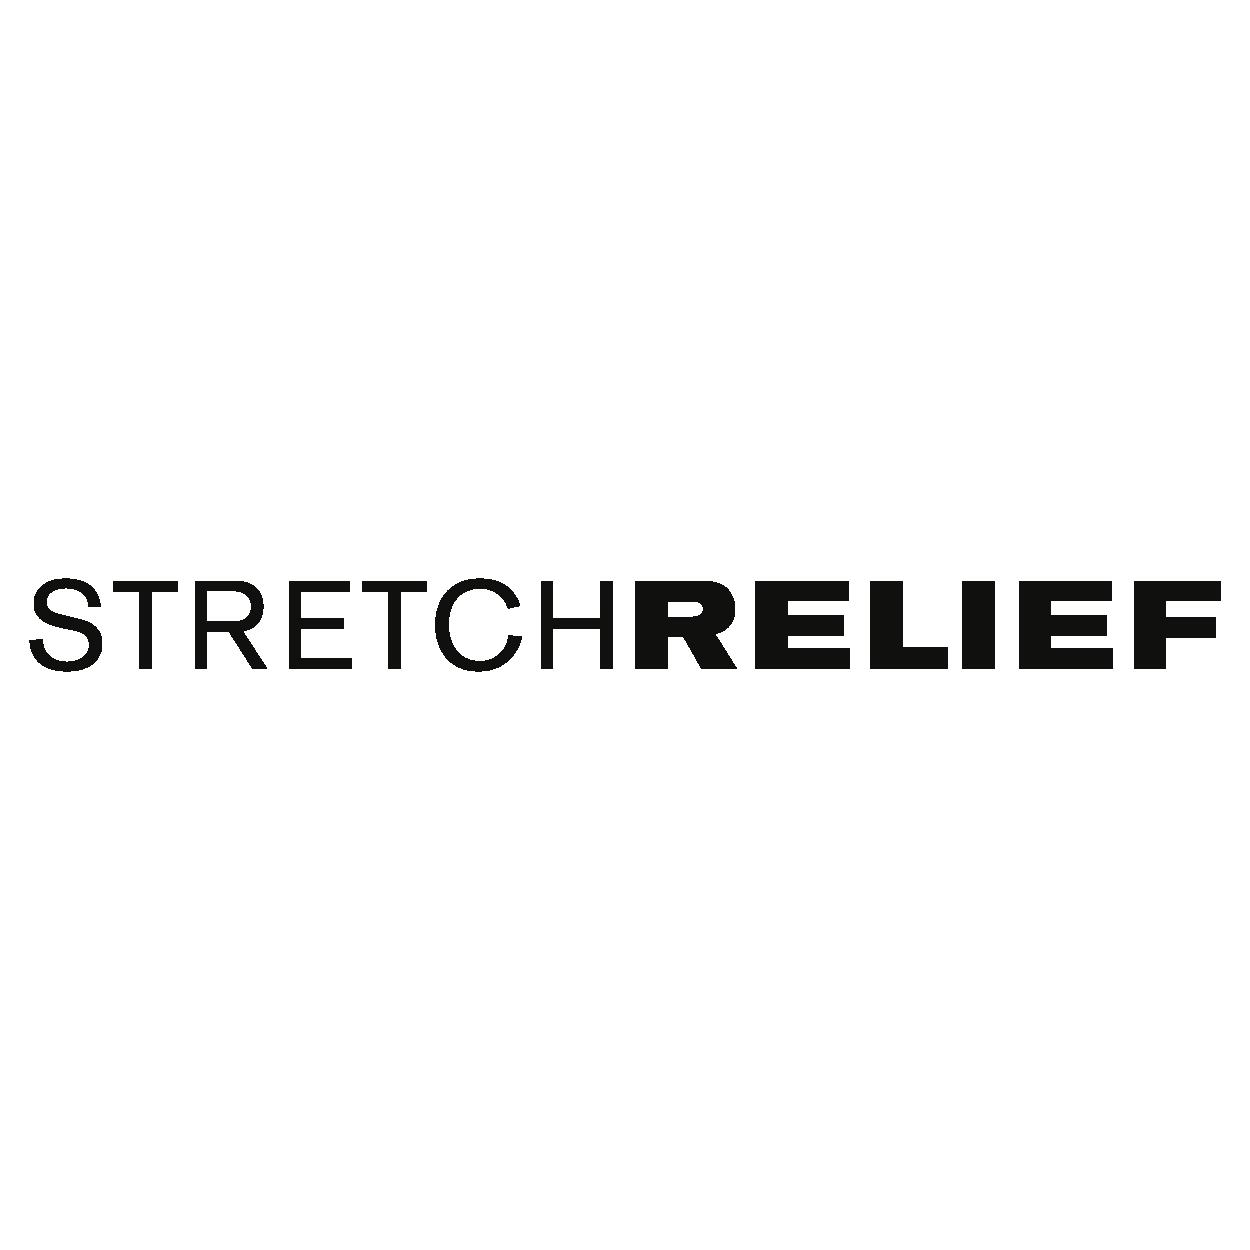 Stretch Relief